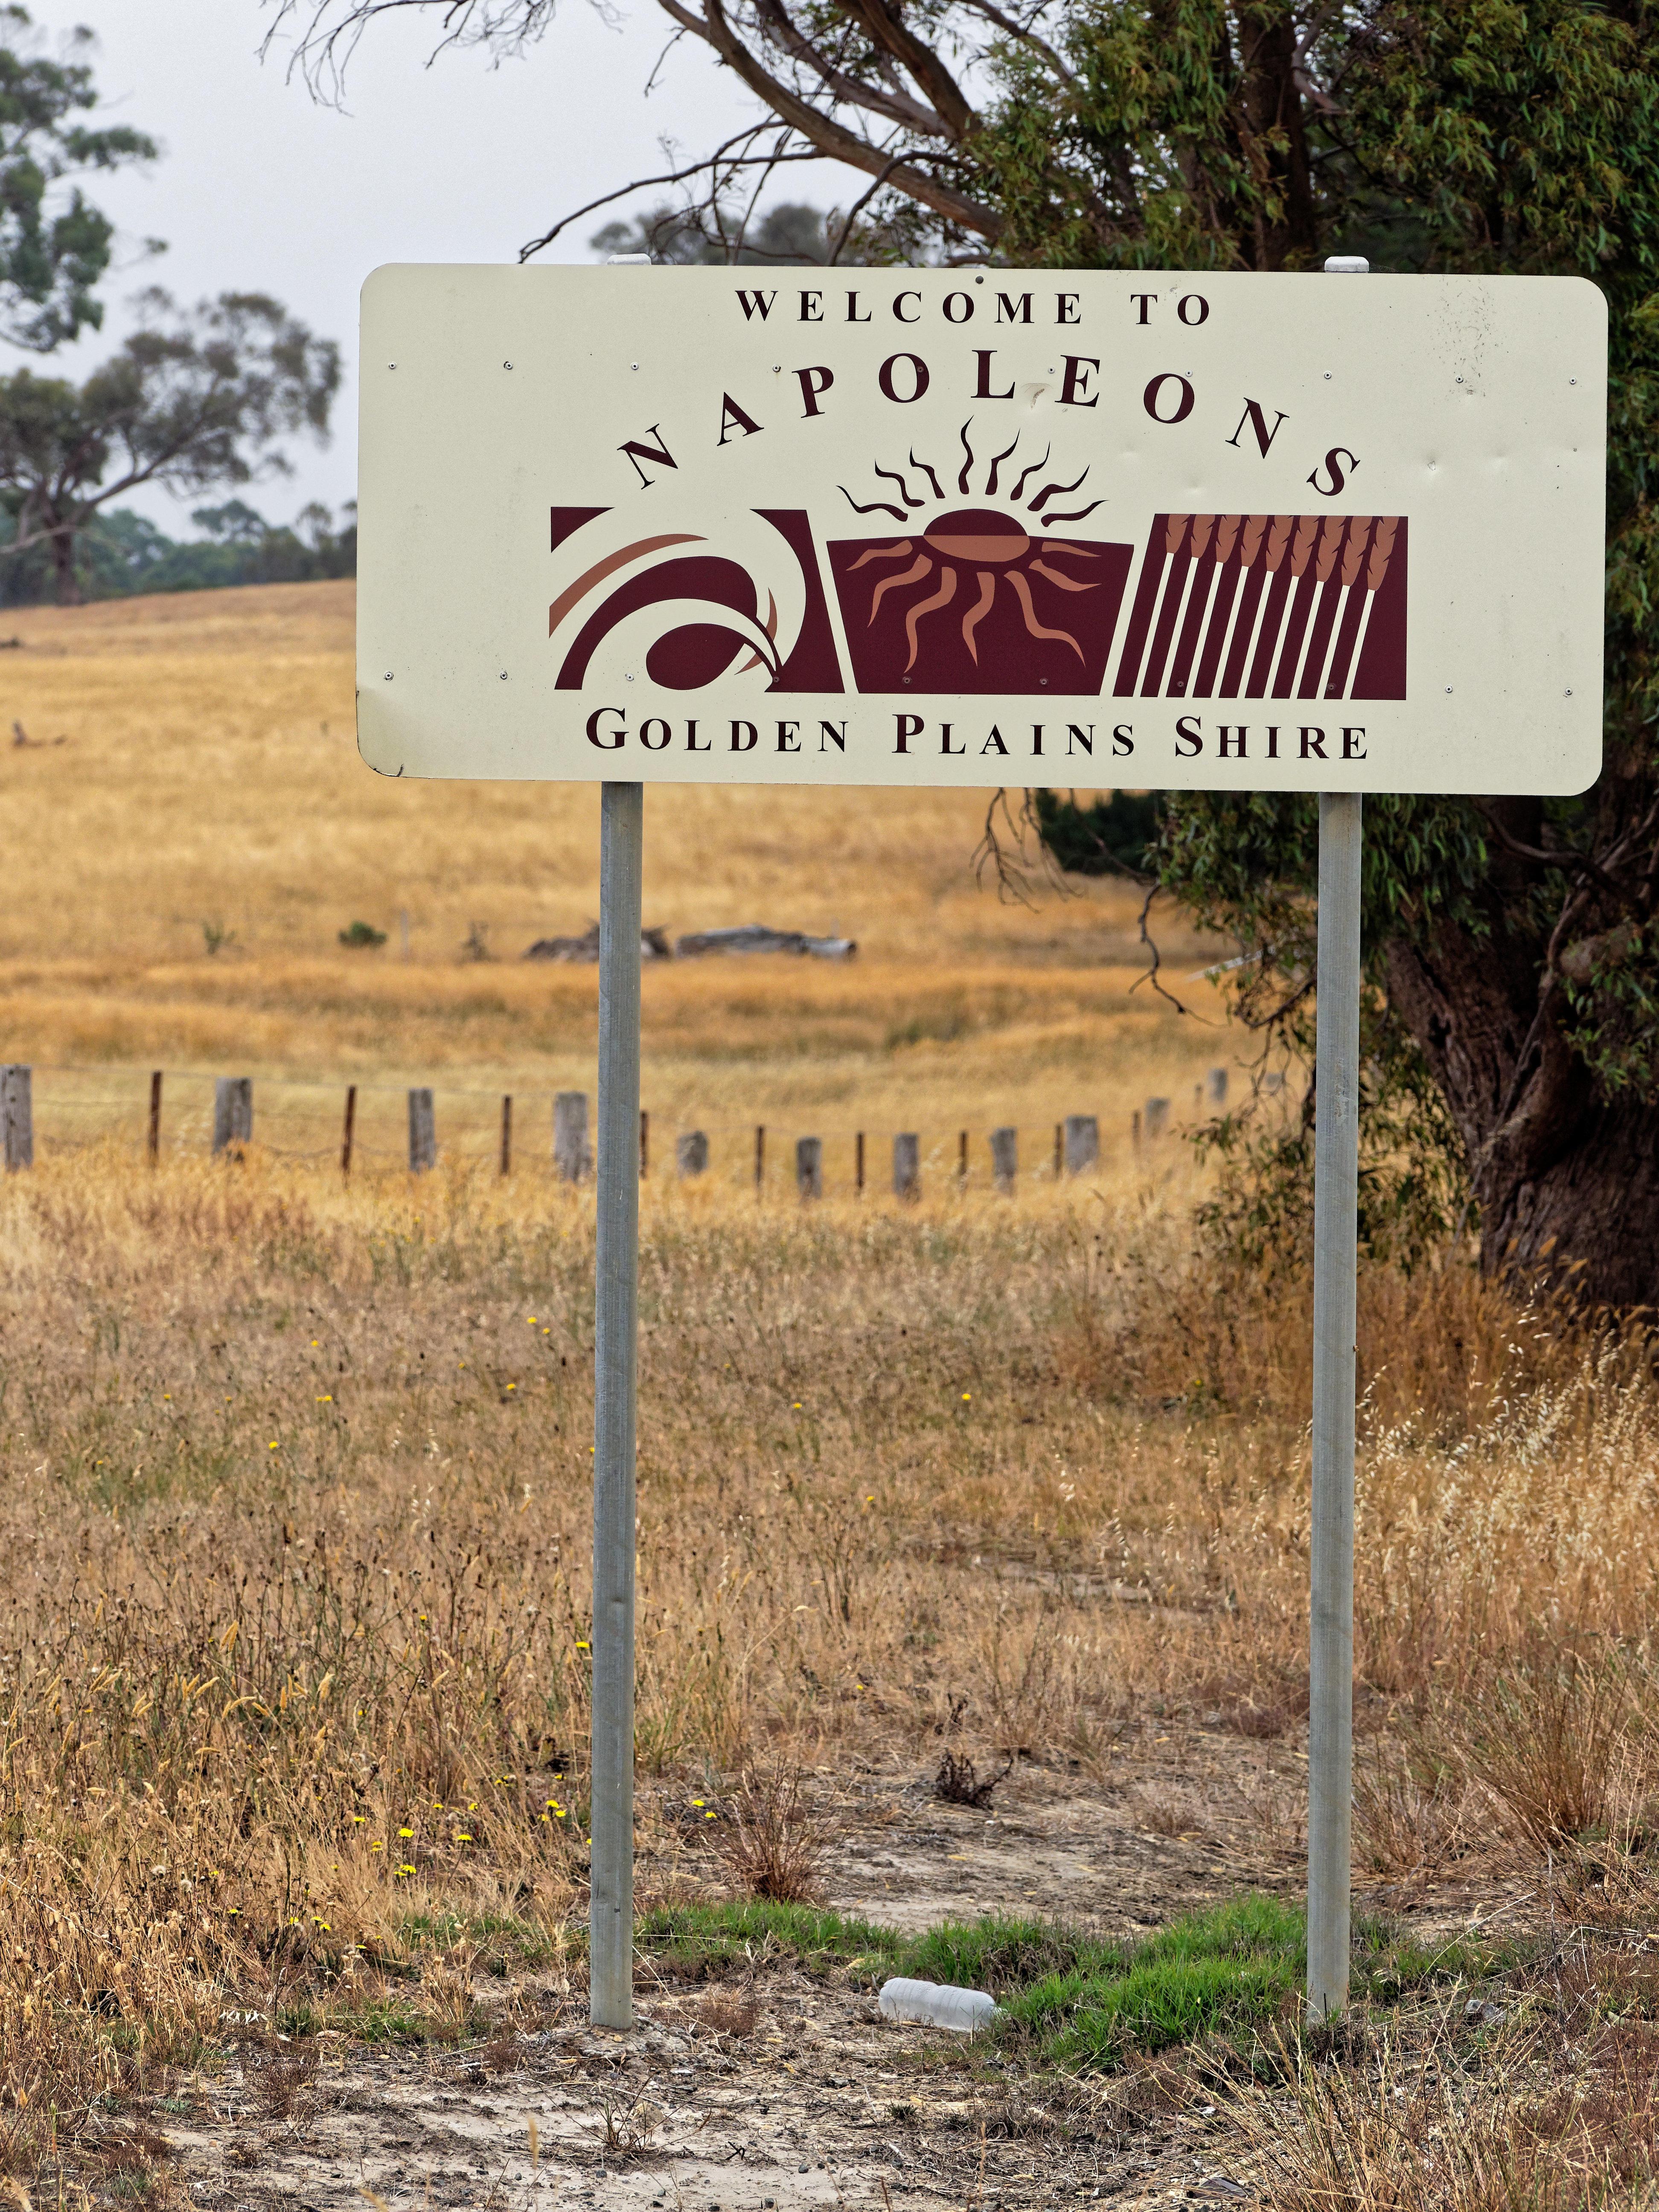 Napoleons-town-sign-2.jpeg